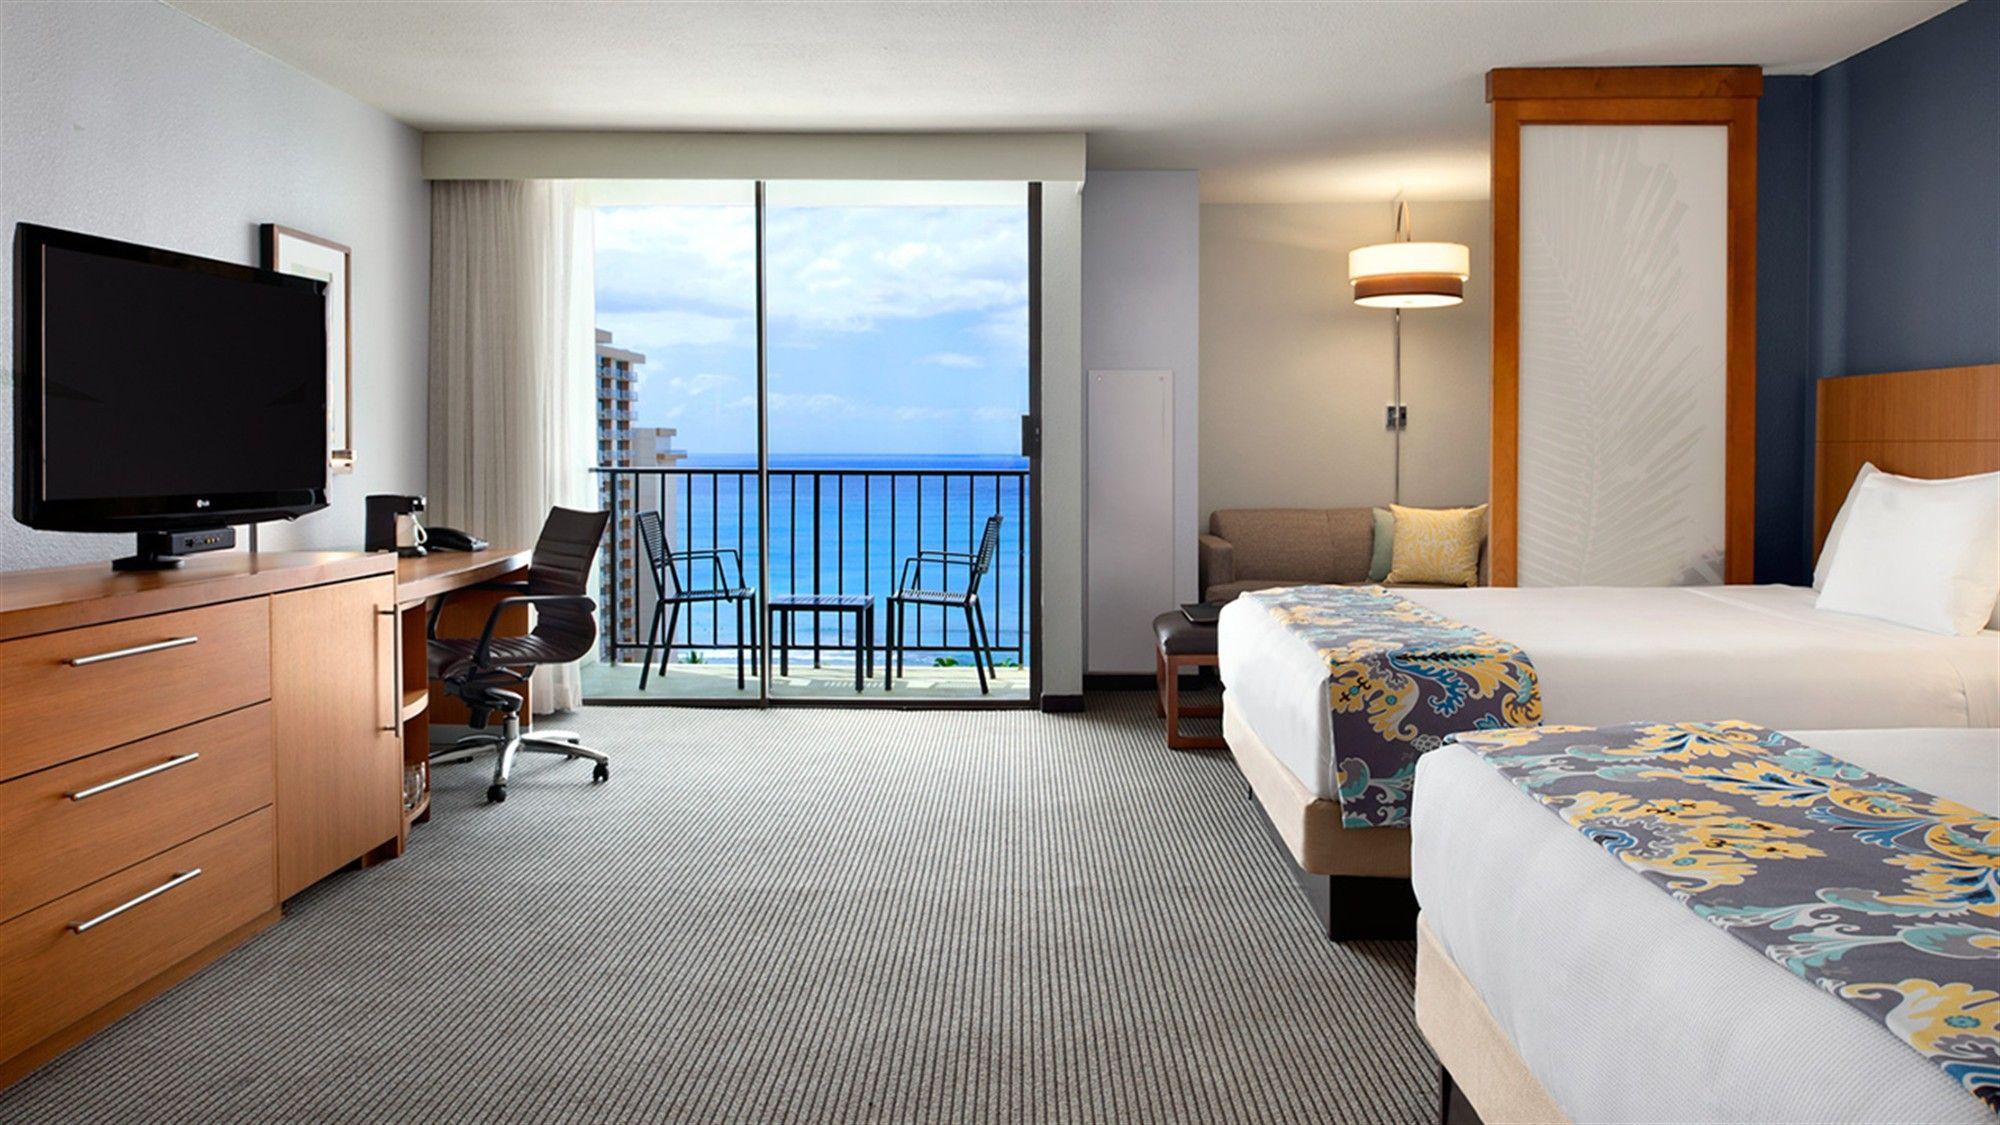 Waikiki Beach Lodging Honolulu Hotel Accommodations Beach Accommodation Honolulu Hotels Hotel